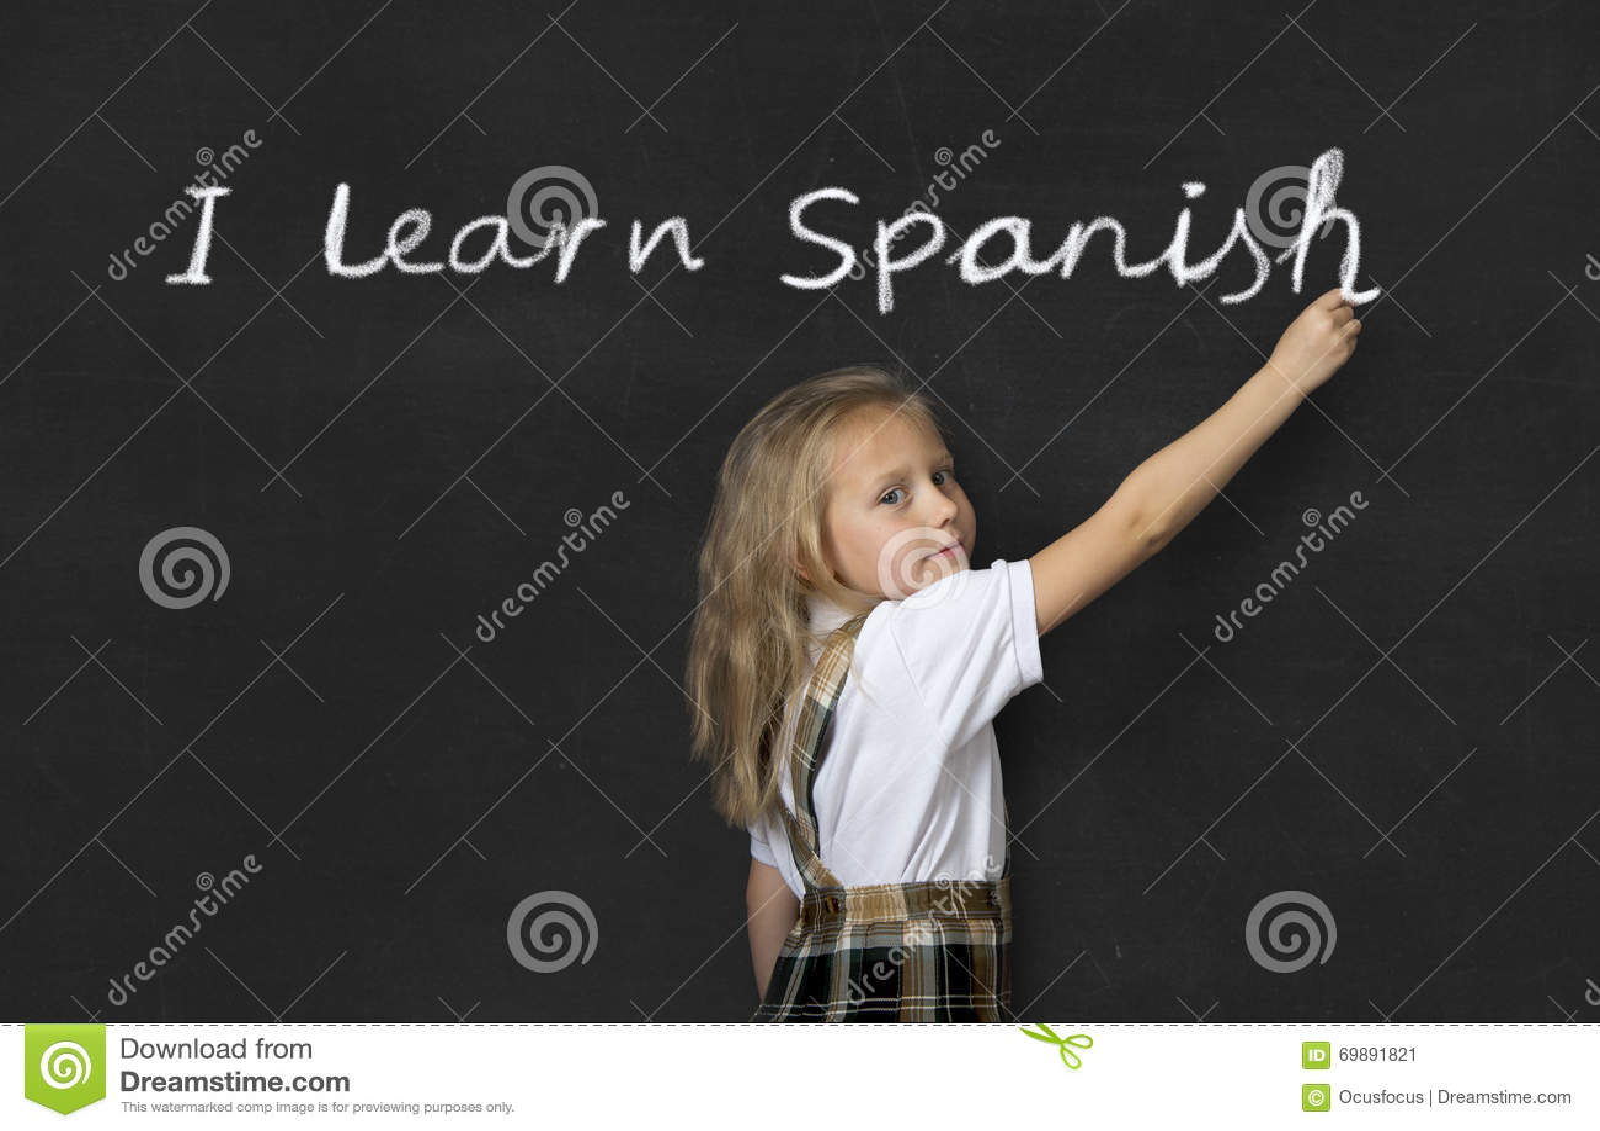 Sweet junior schoolgirl standing happy writing in blackboard I learn Spanish